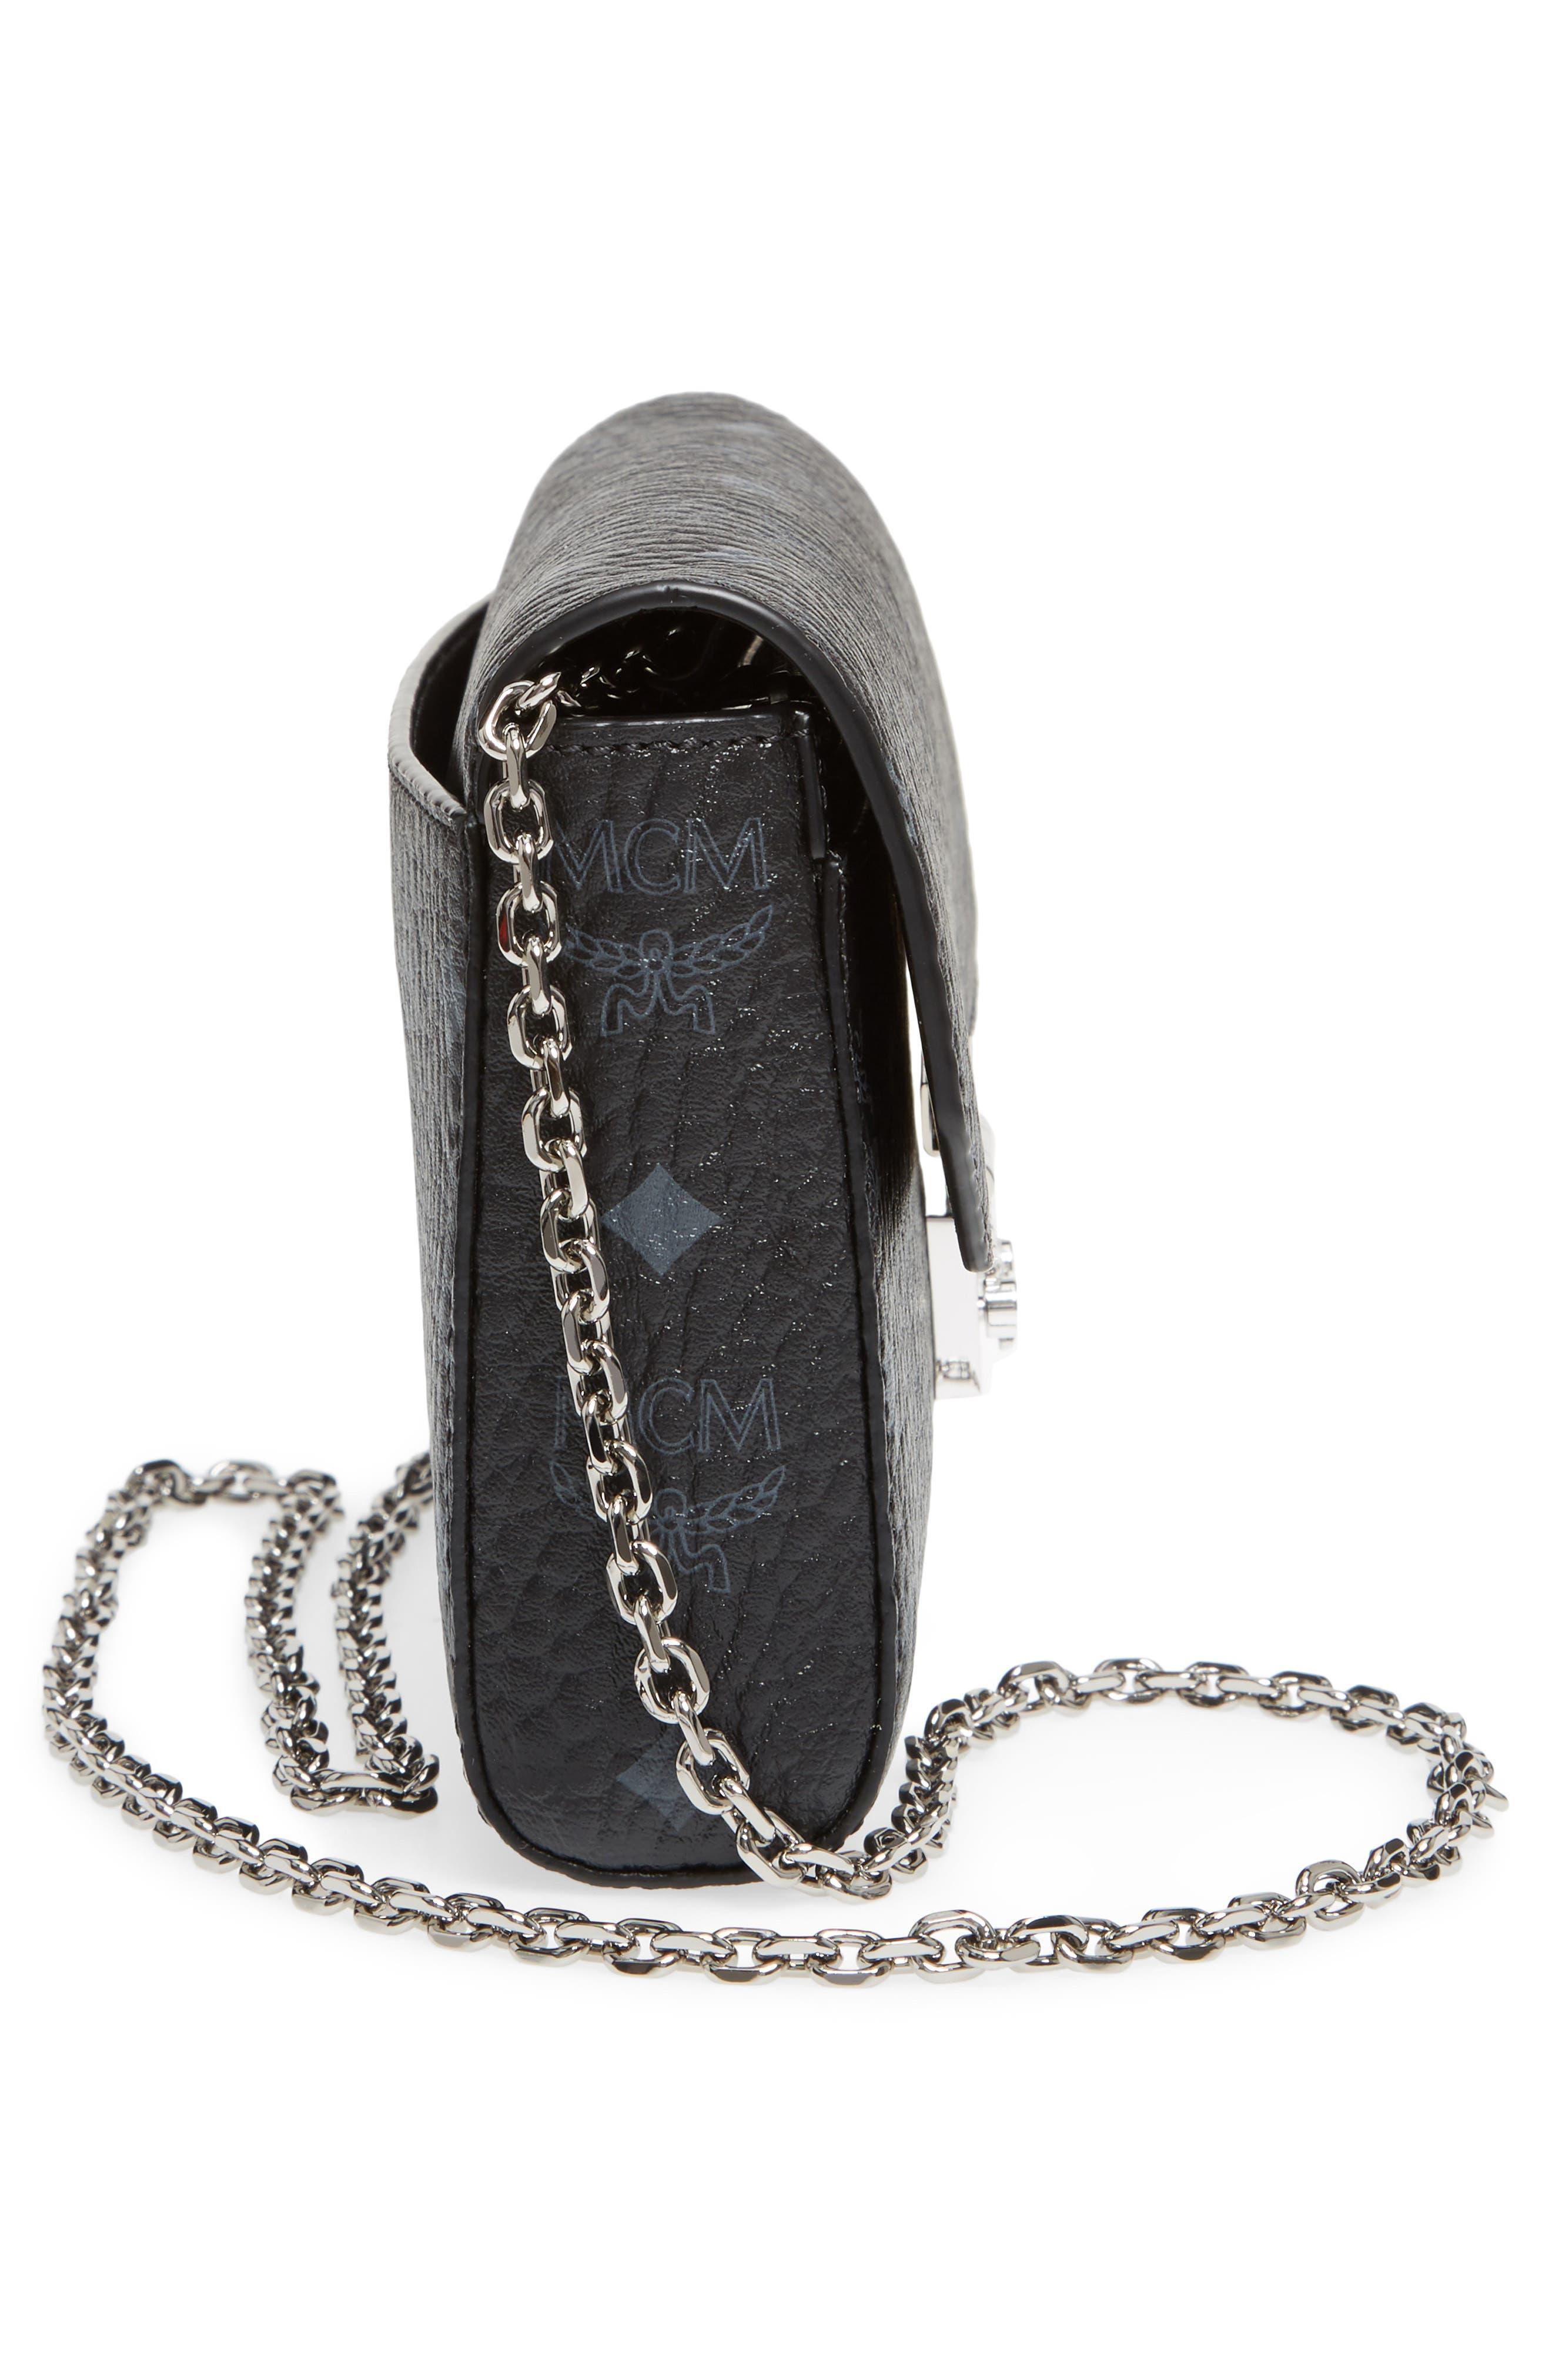 Millie Monogrammed Leather Crossbody Bag,                             Alternate thumbnail 5, color,                             001